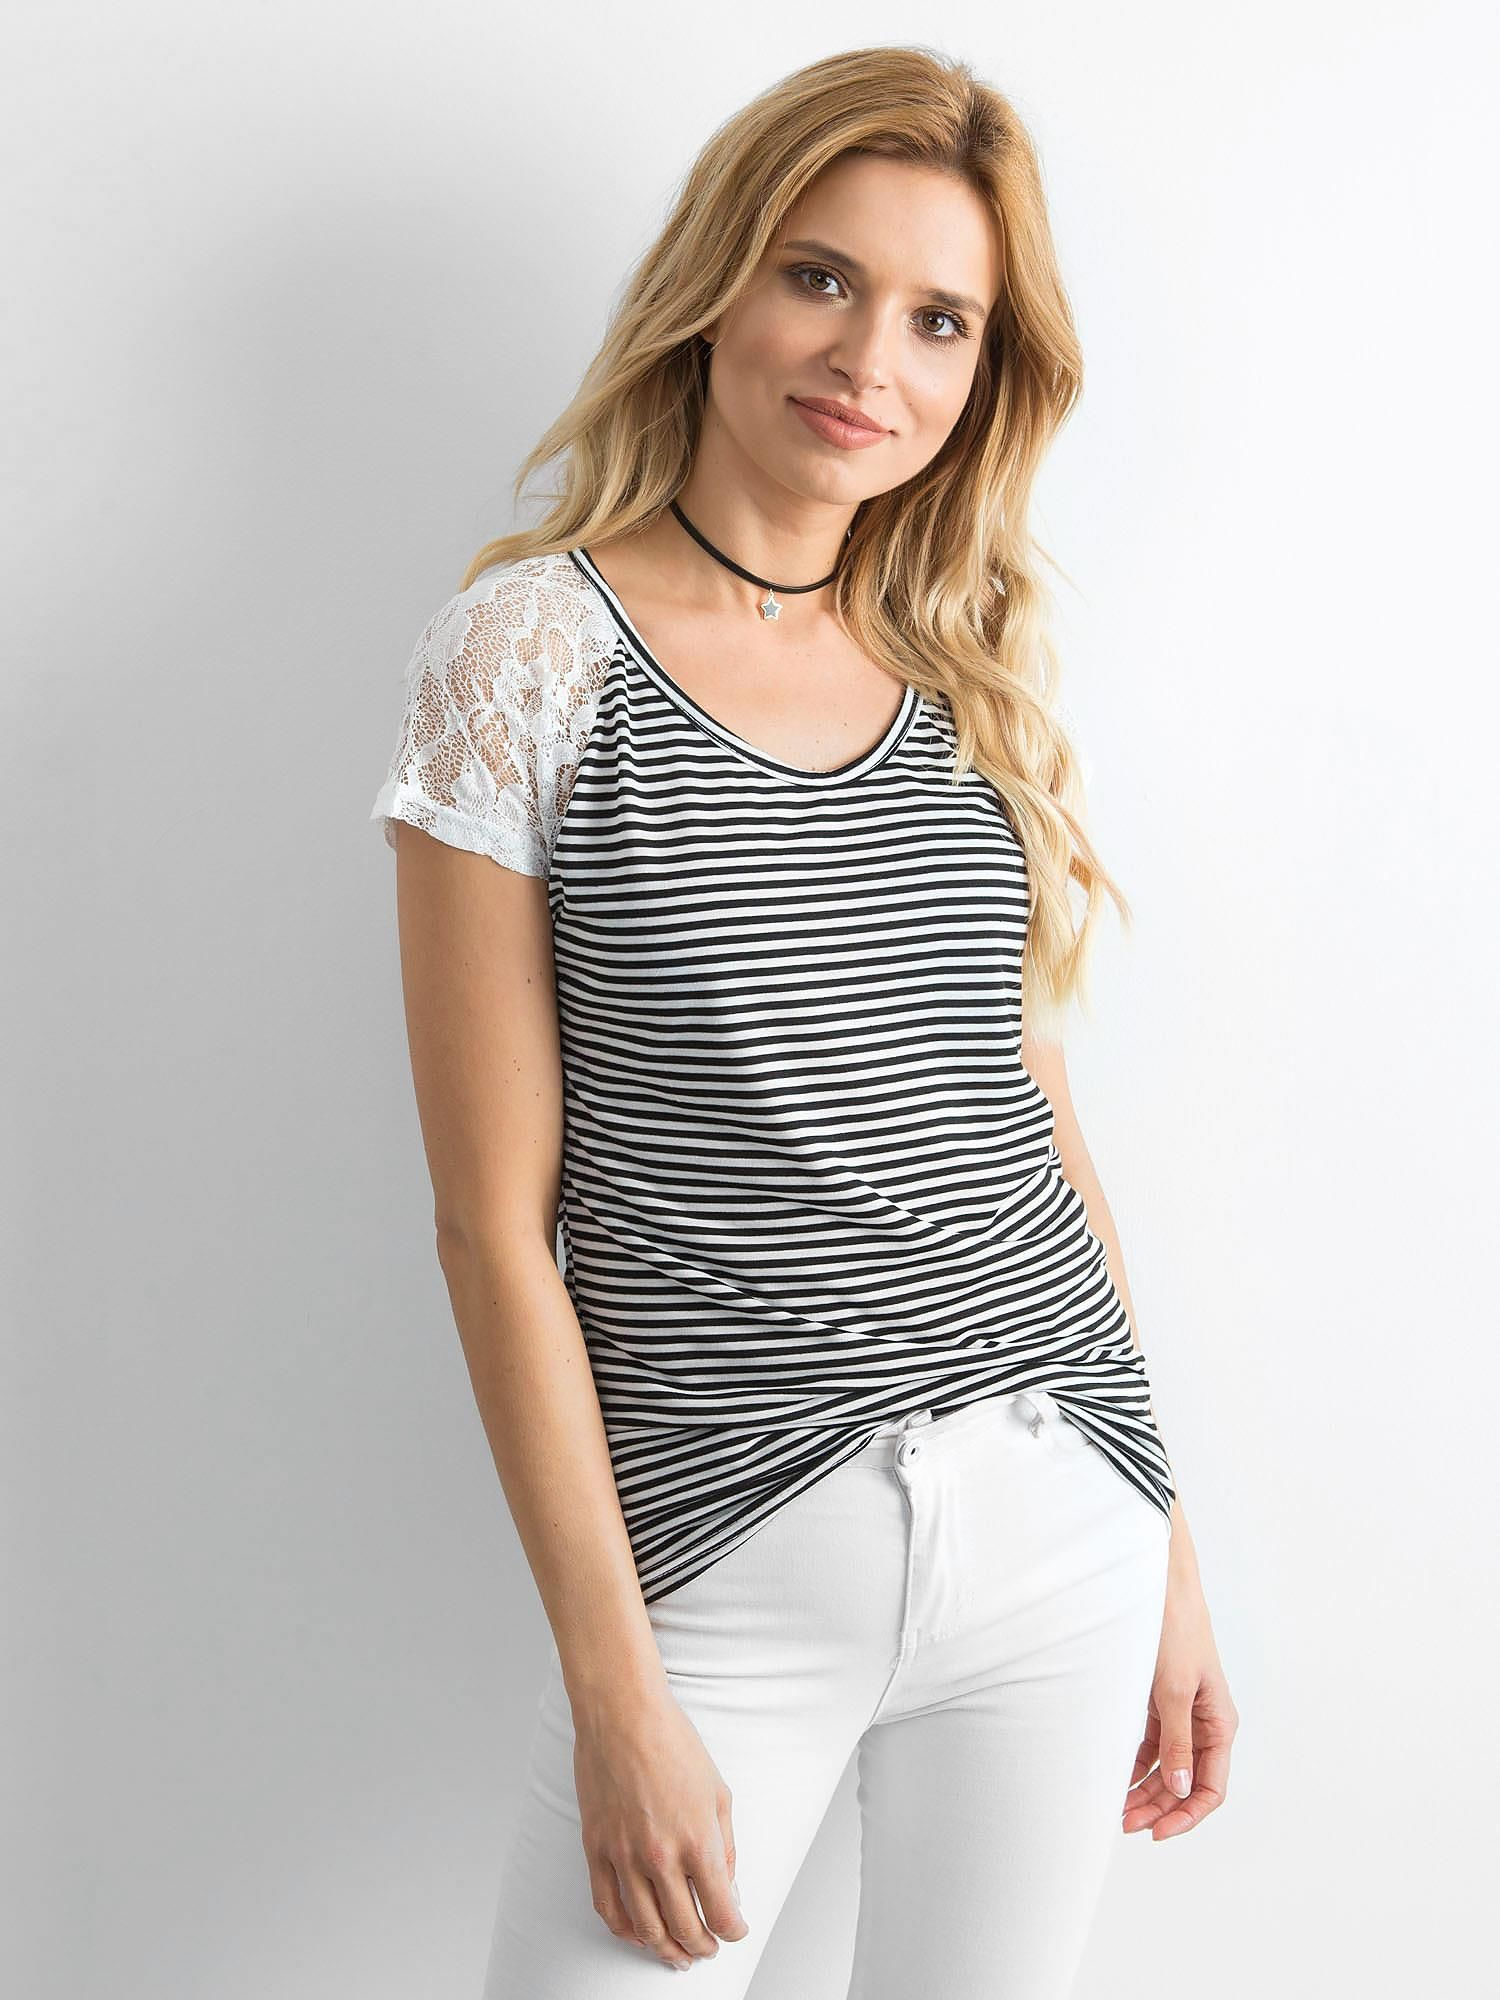 b24393ccb754d Biało-czarny t-shirt w paski - T-shirt z nadrukiem - sklep eButik.pl